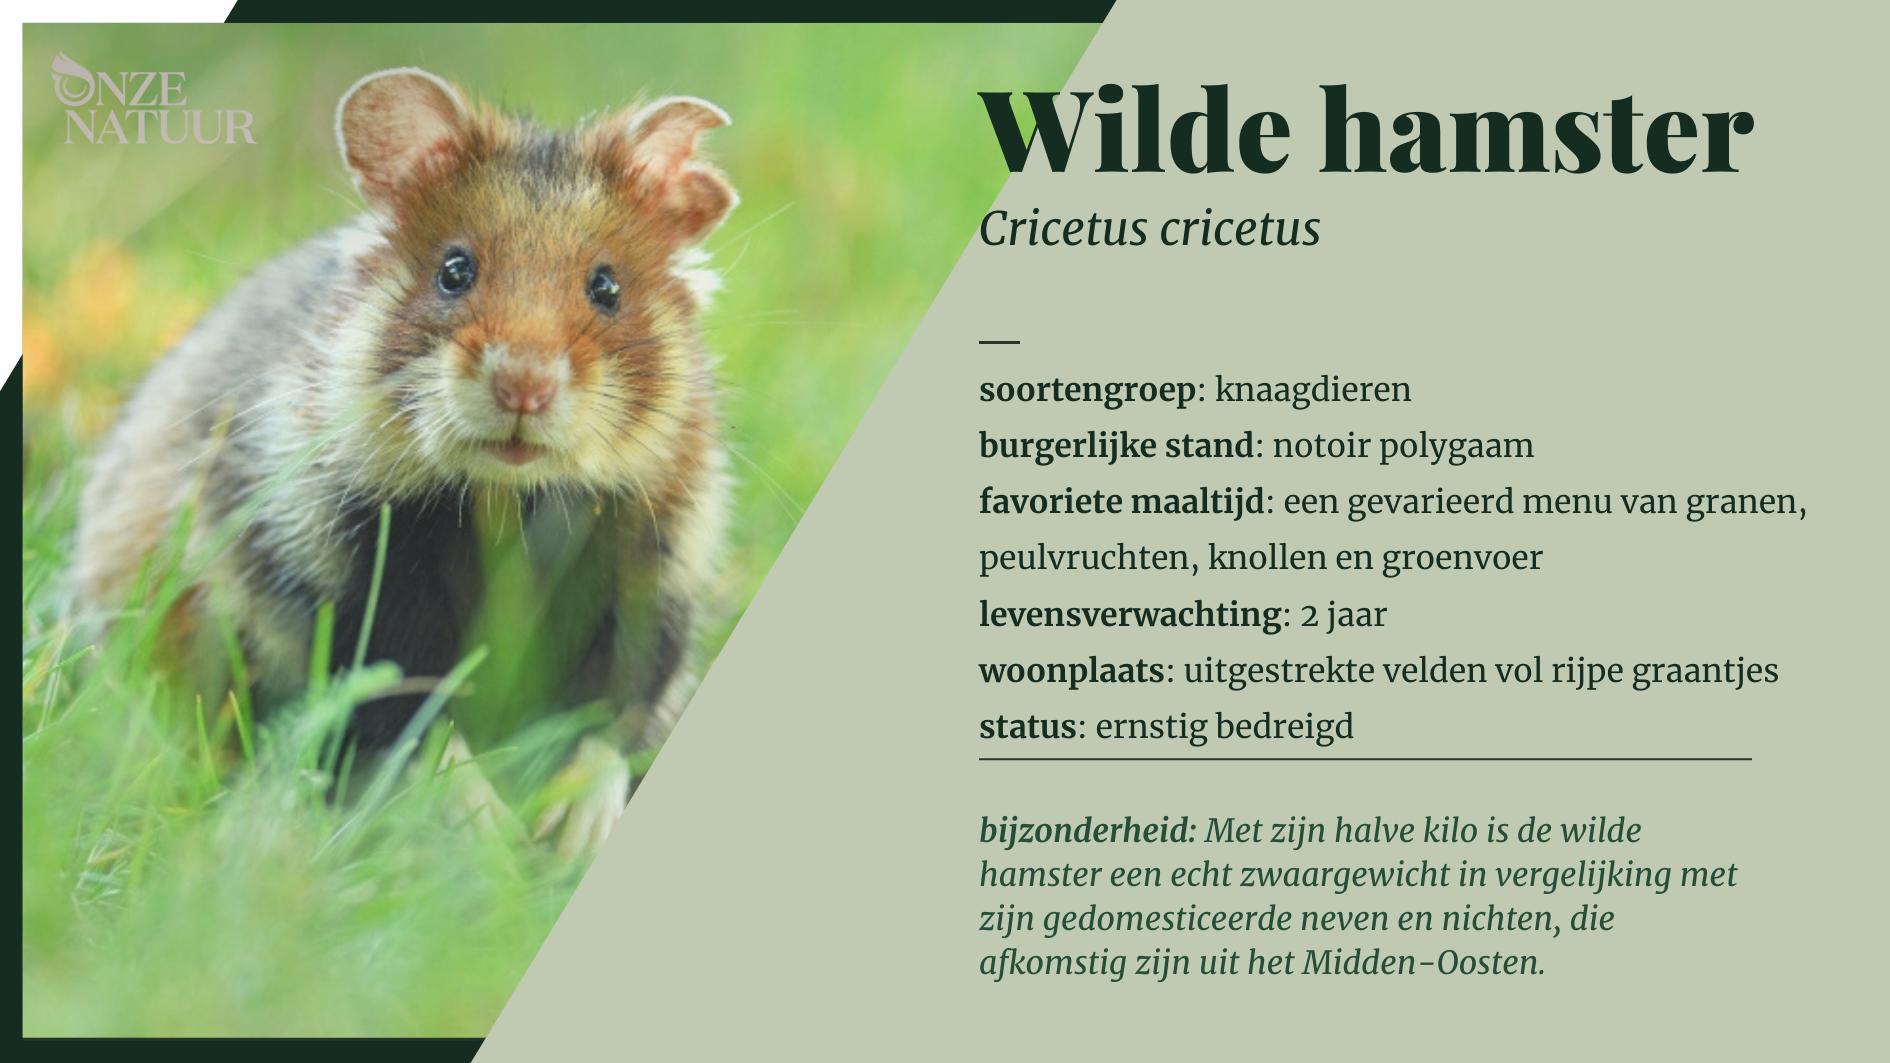 Fiche Wilde hamster